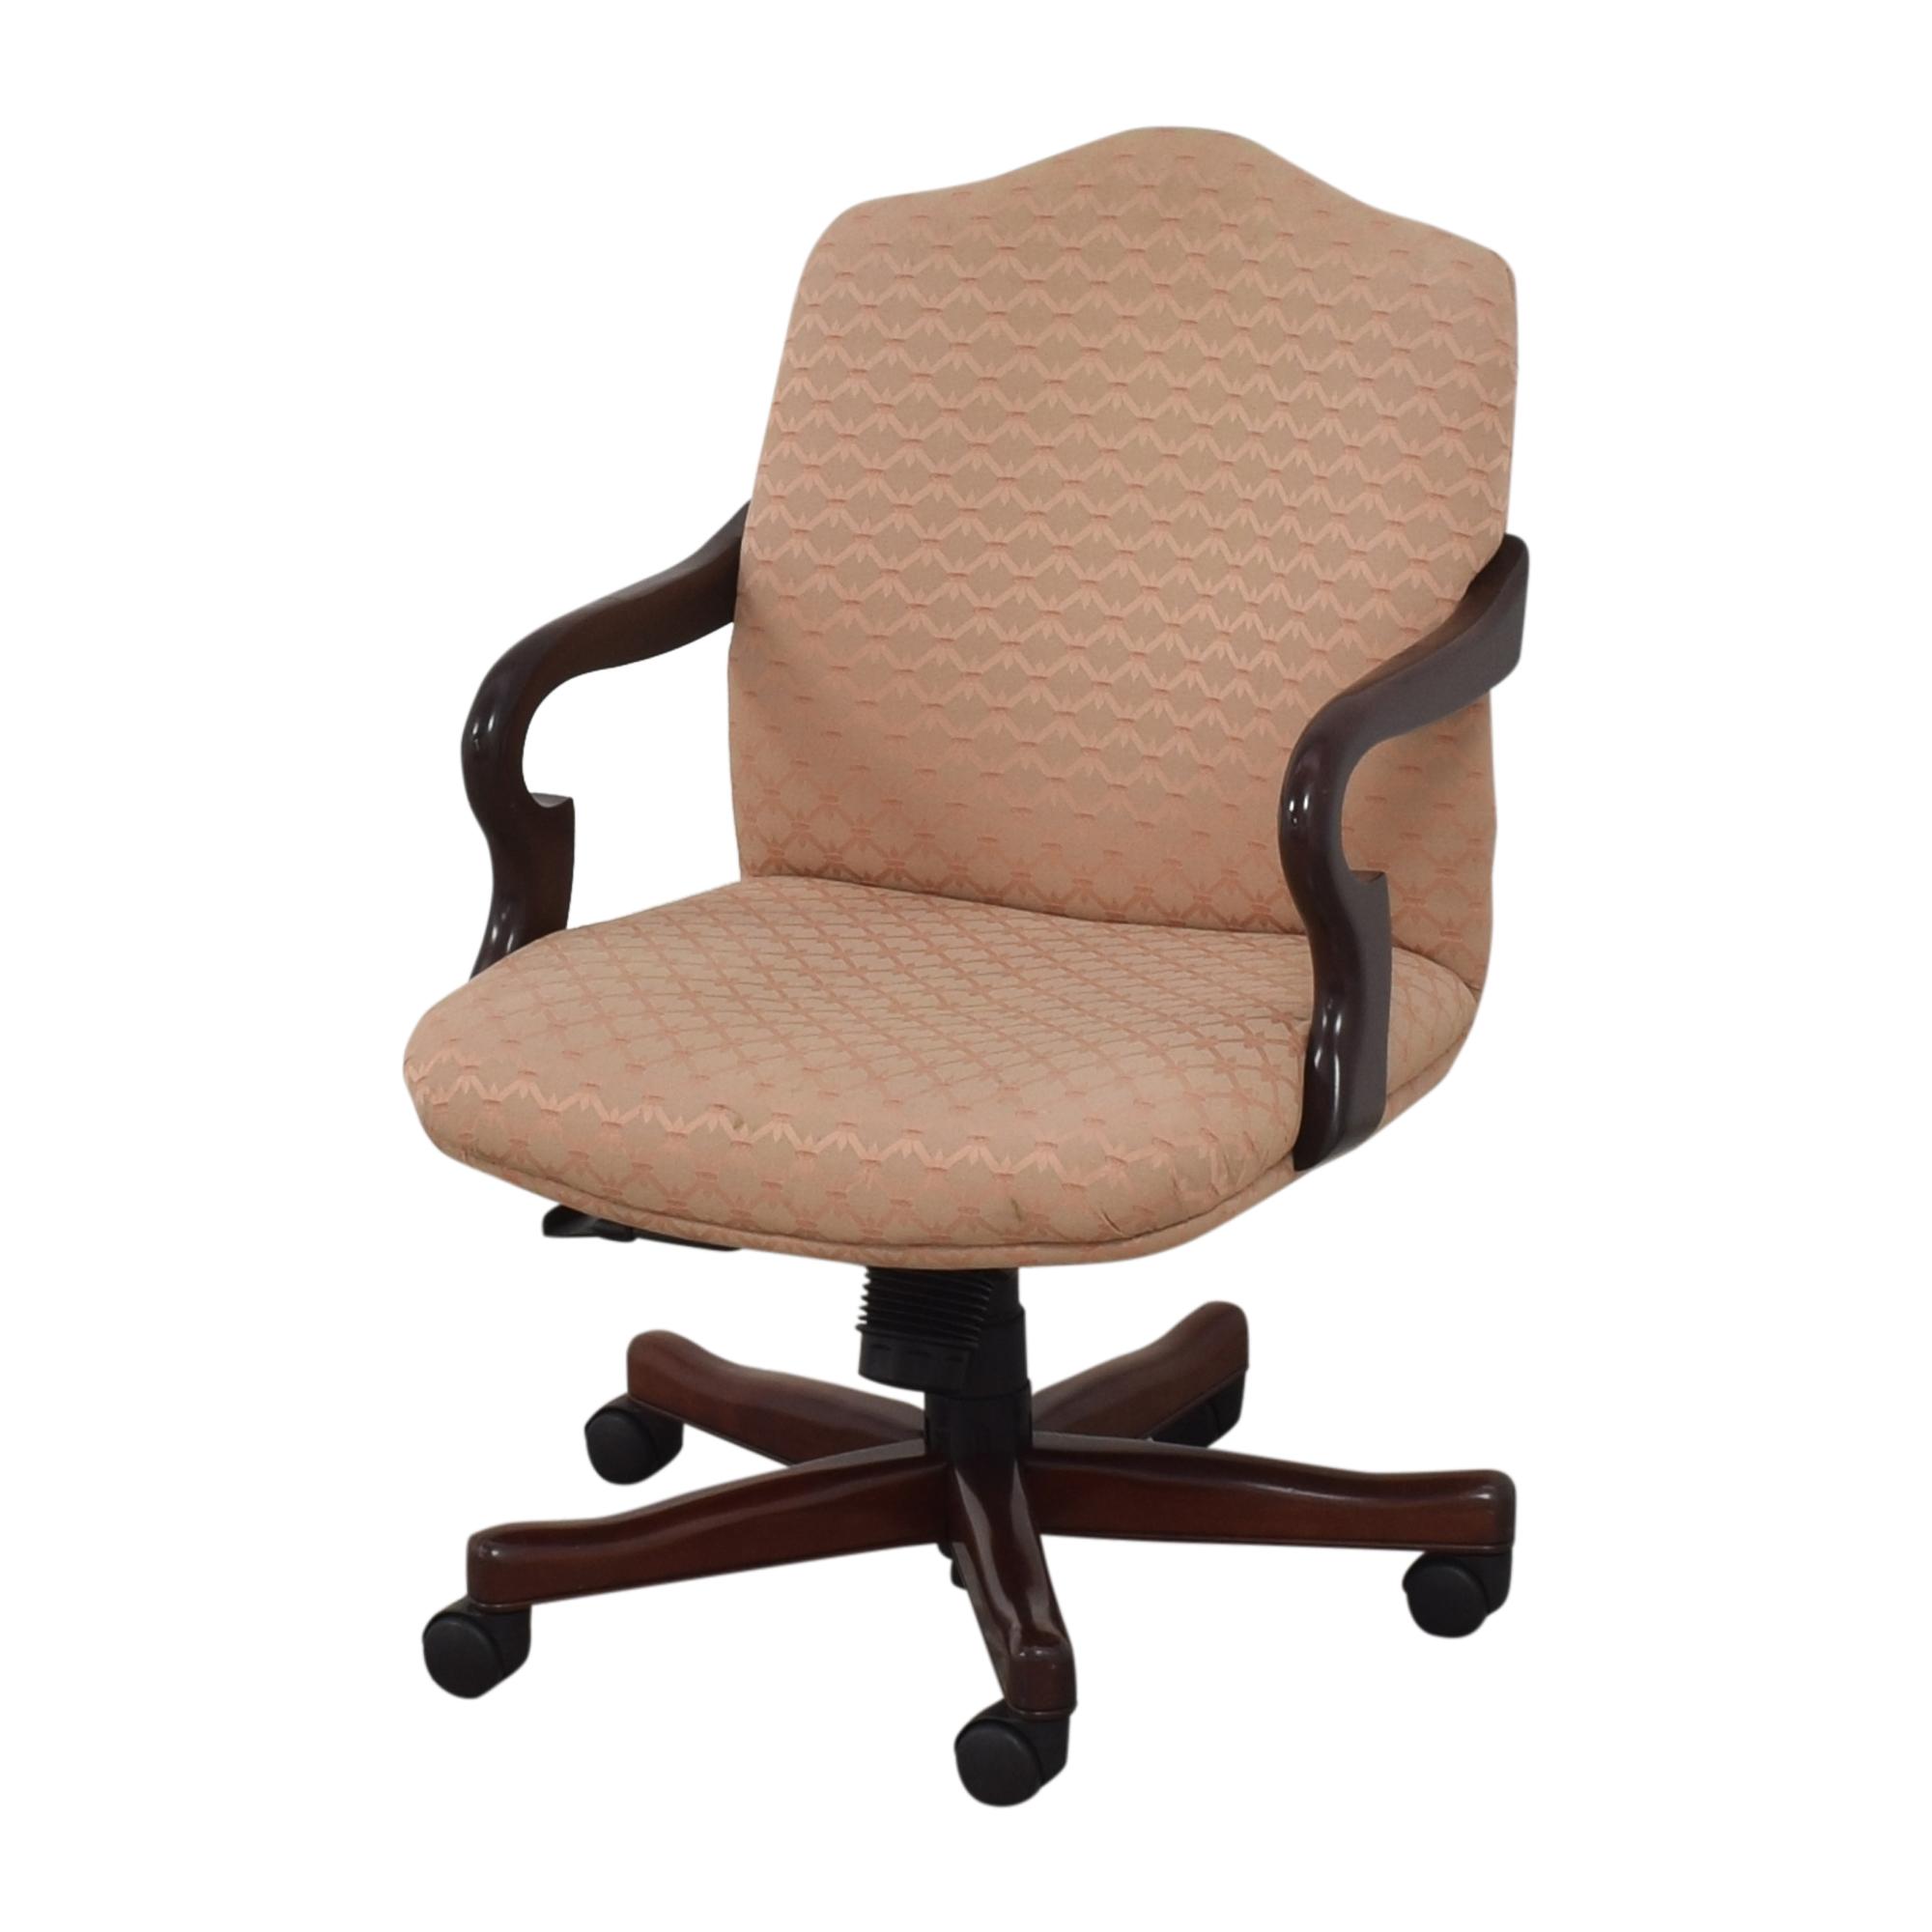 Jofco Jofco Swivel Tilt Office Chair price